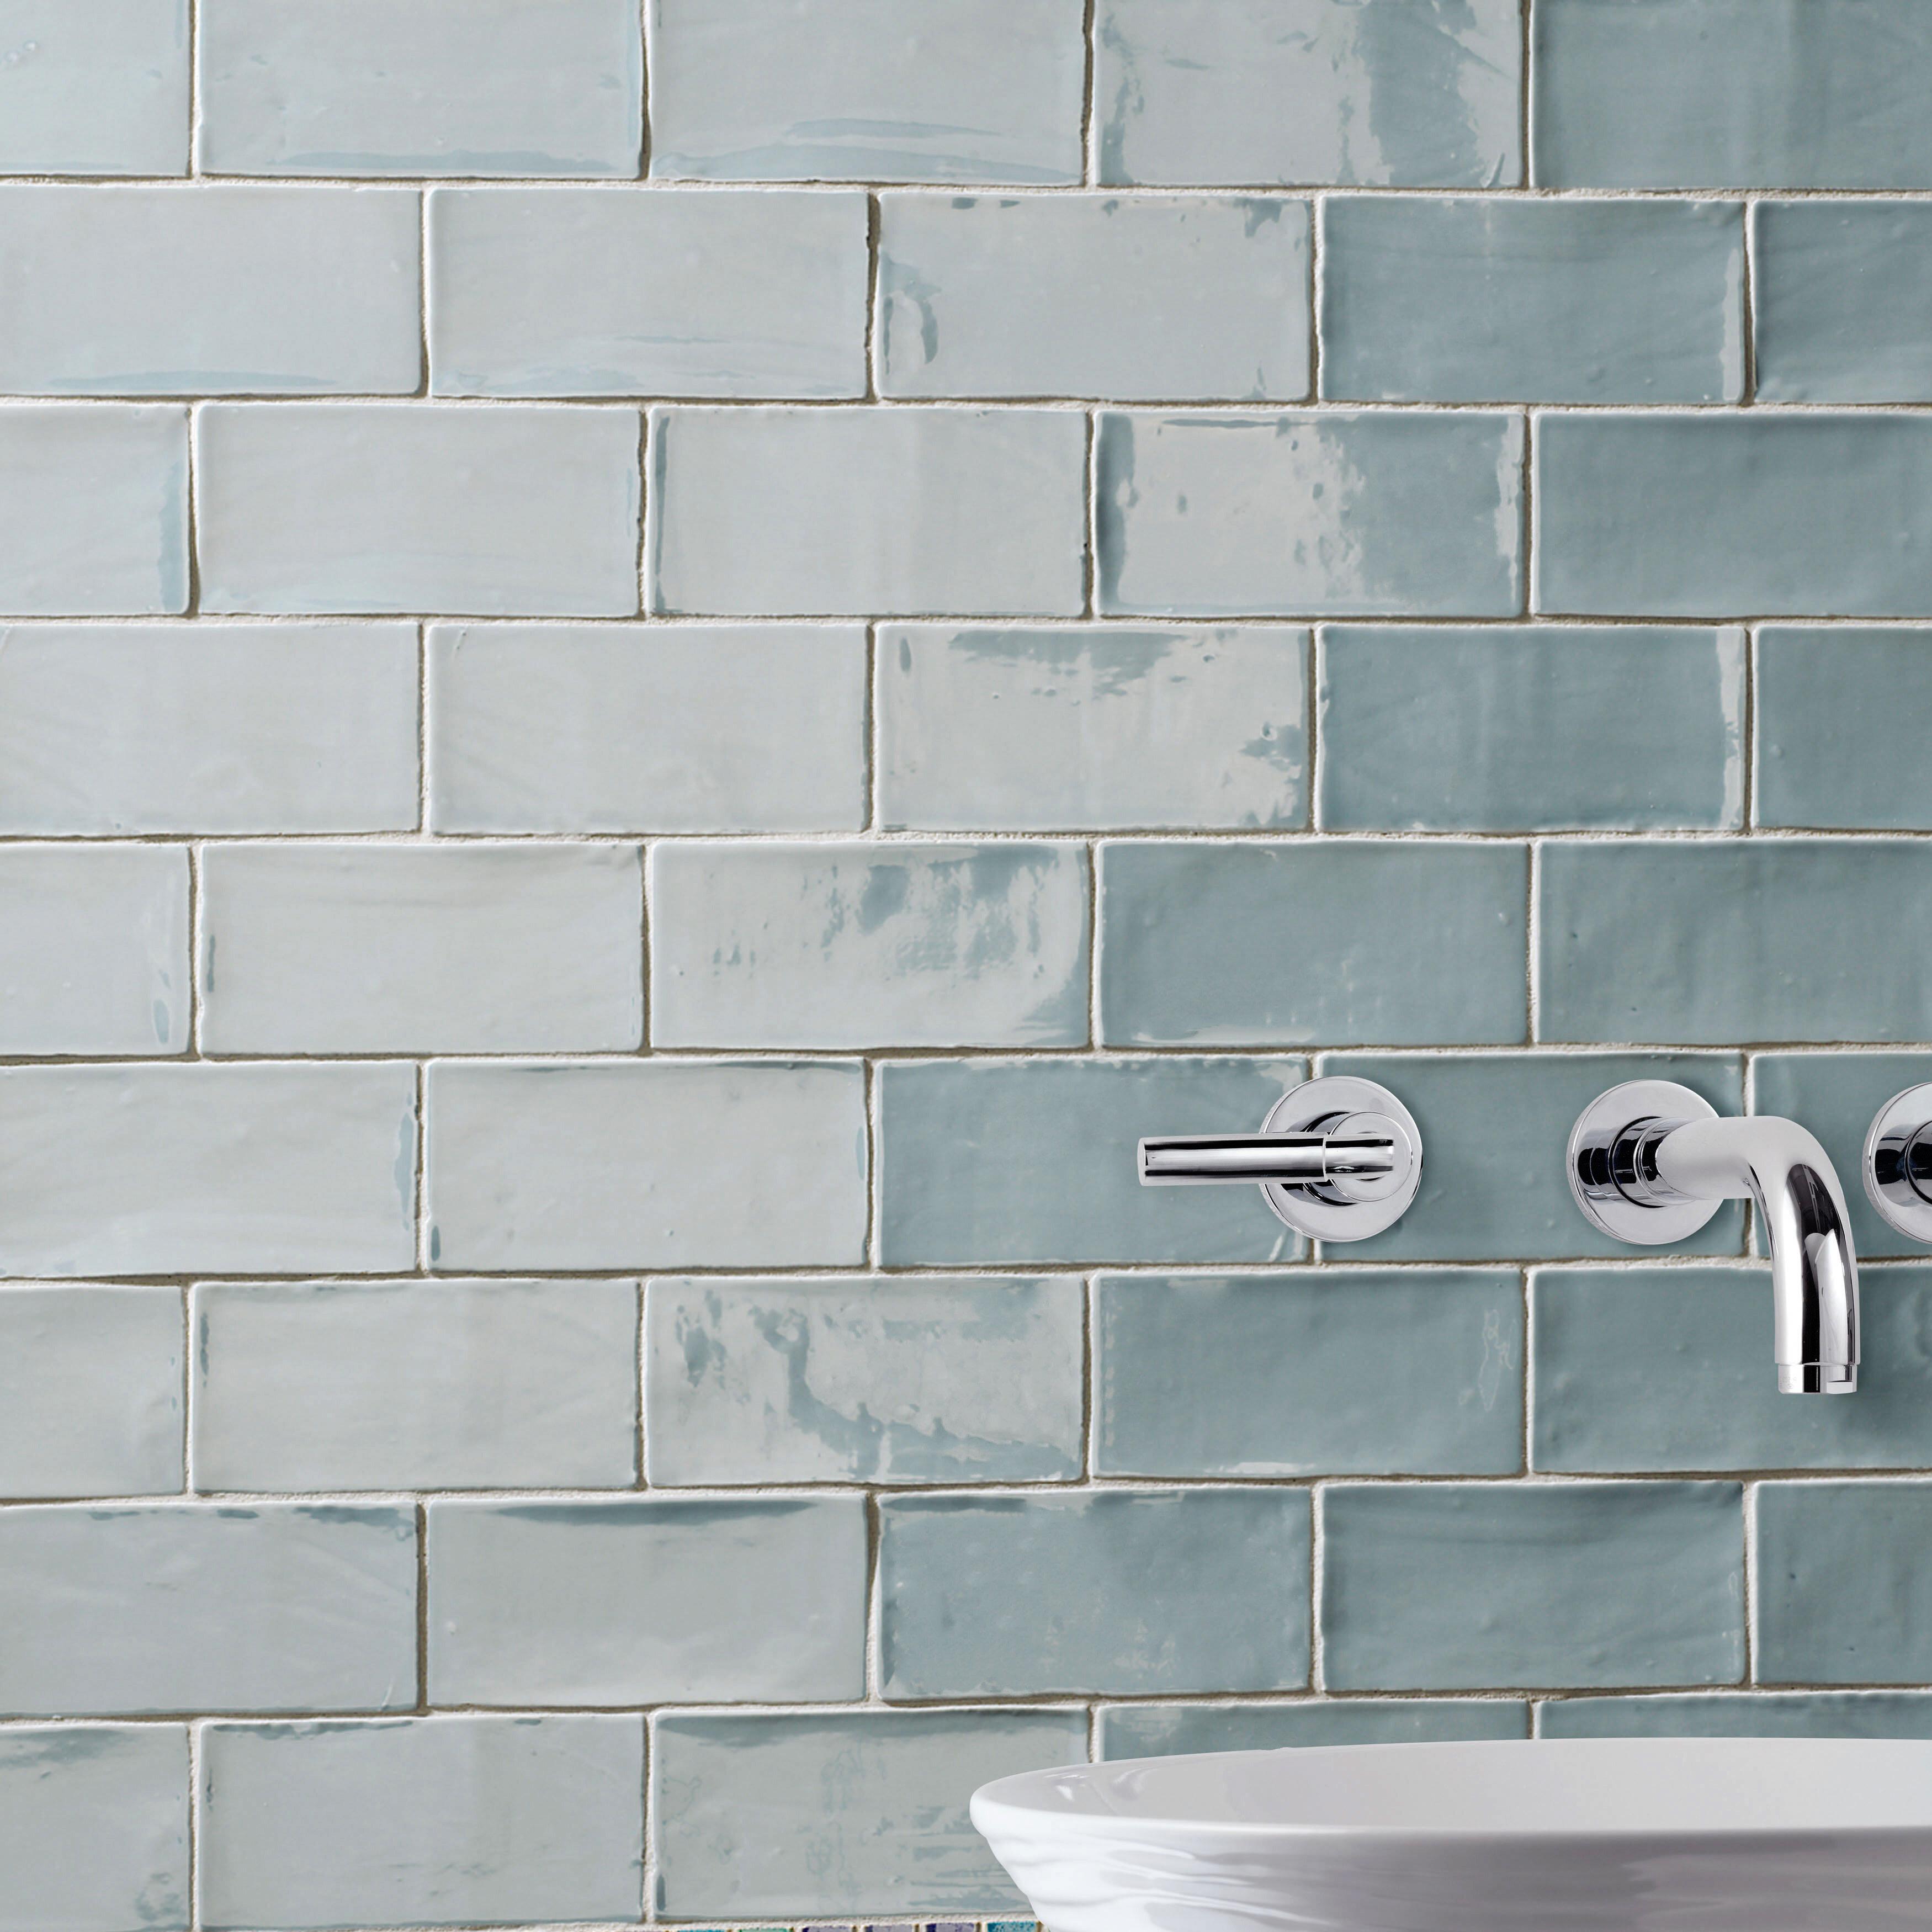 Elitetile Tivoli 3 X 6 Ceramic Subway Tile In Aqua Blue Reviews Wayfair